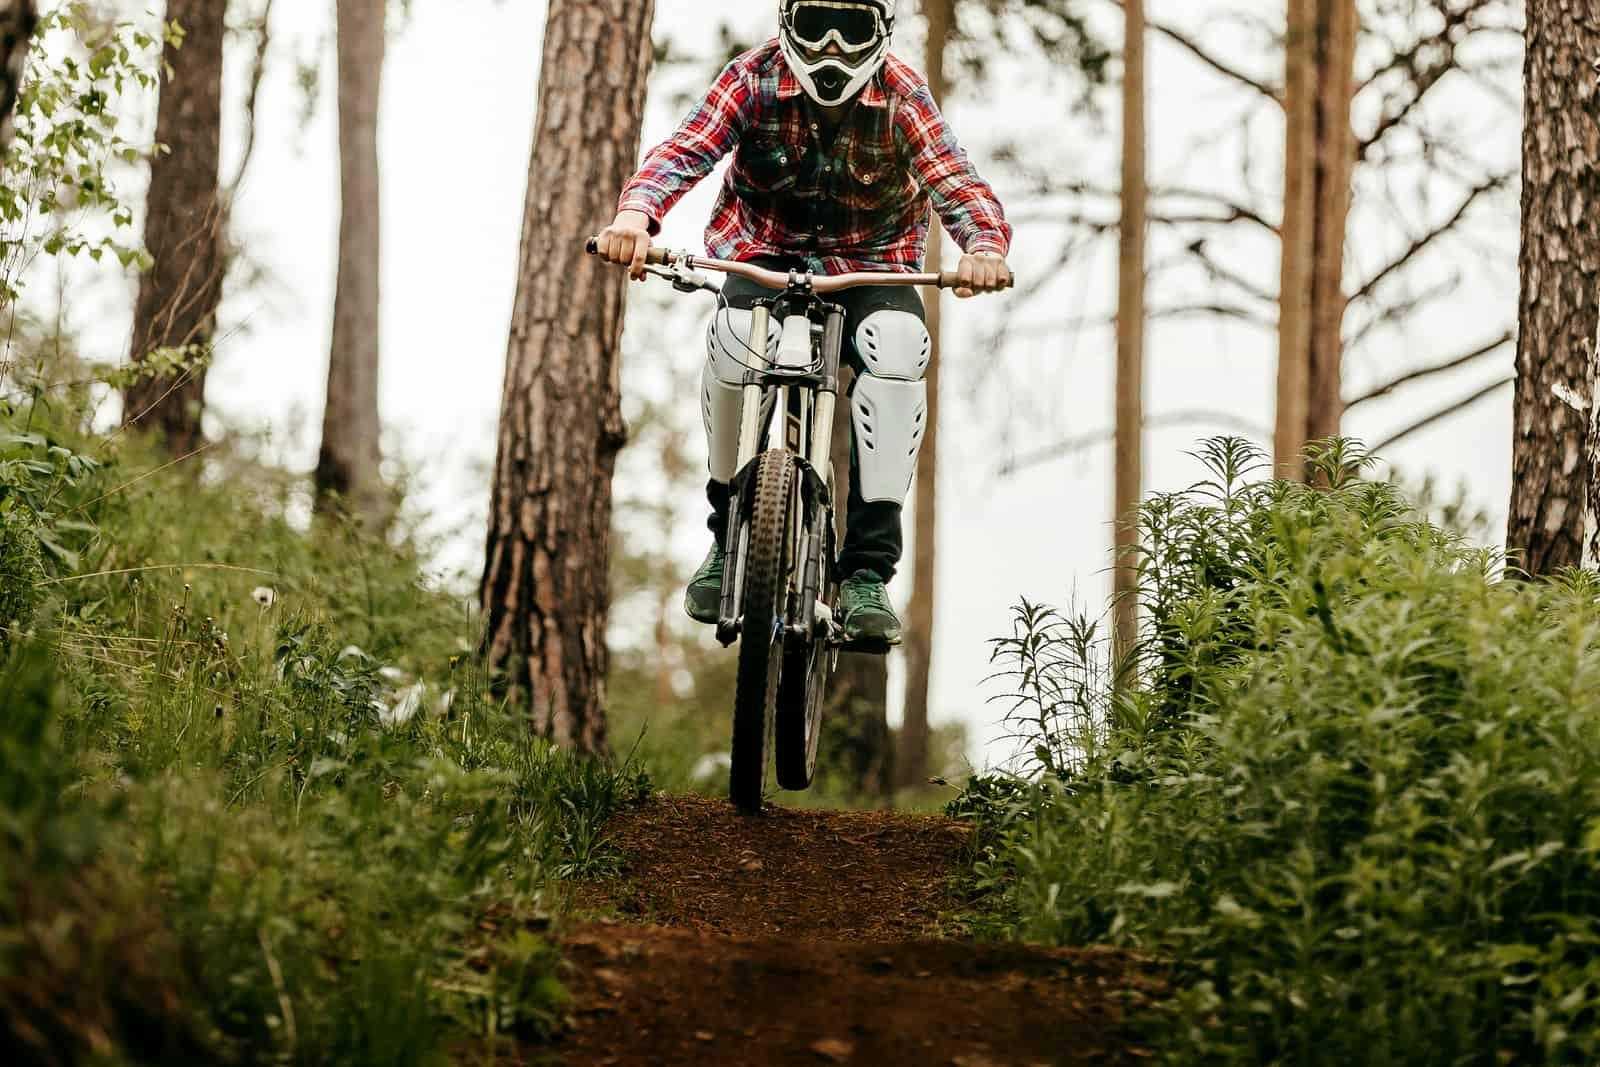 the invention of mountain biking in muddy terrain